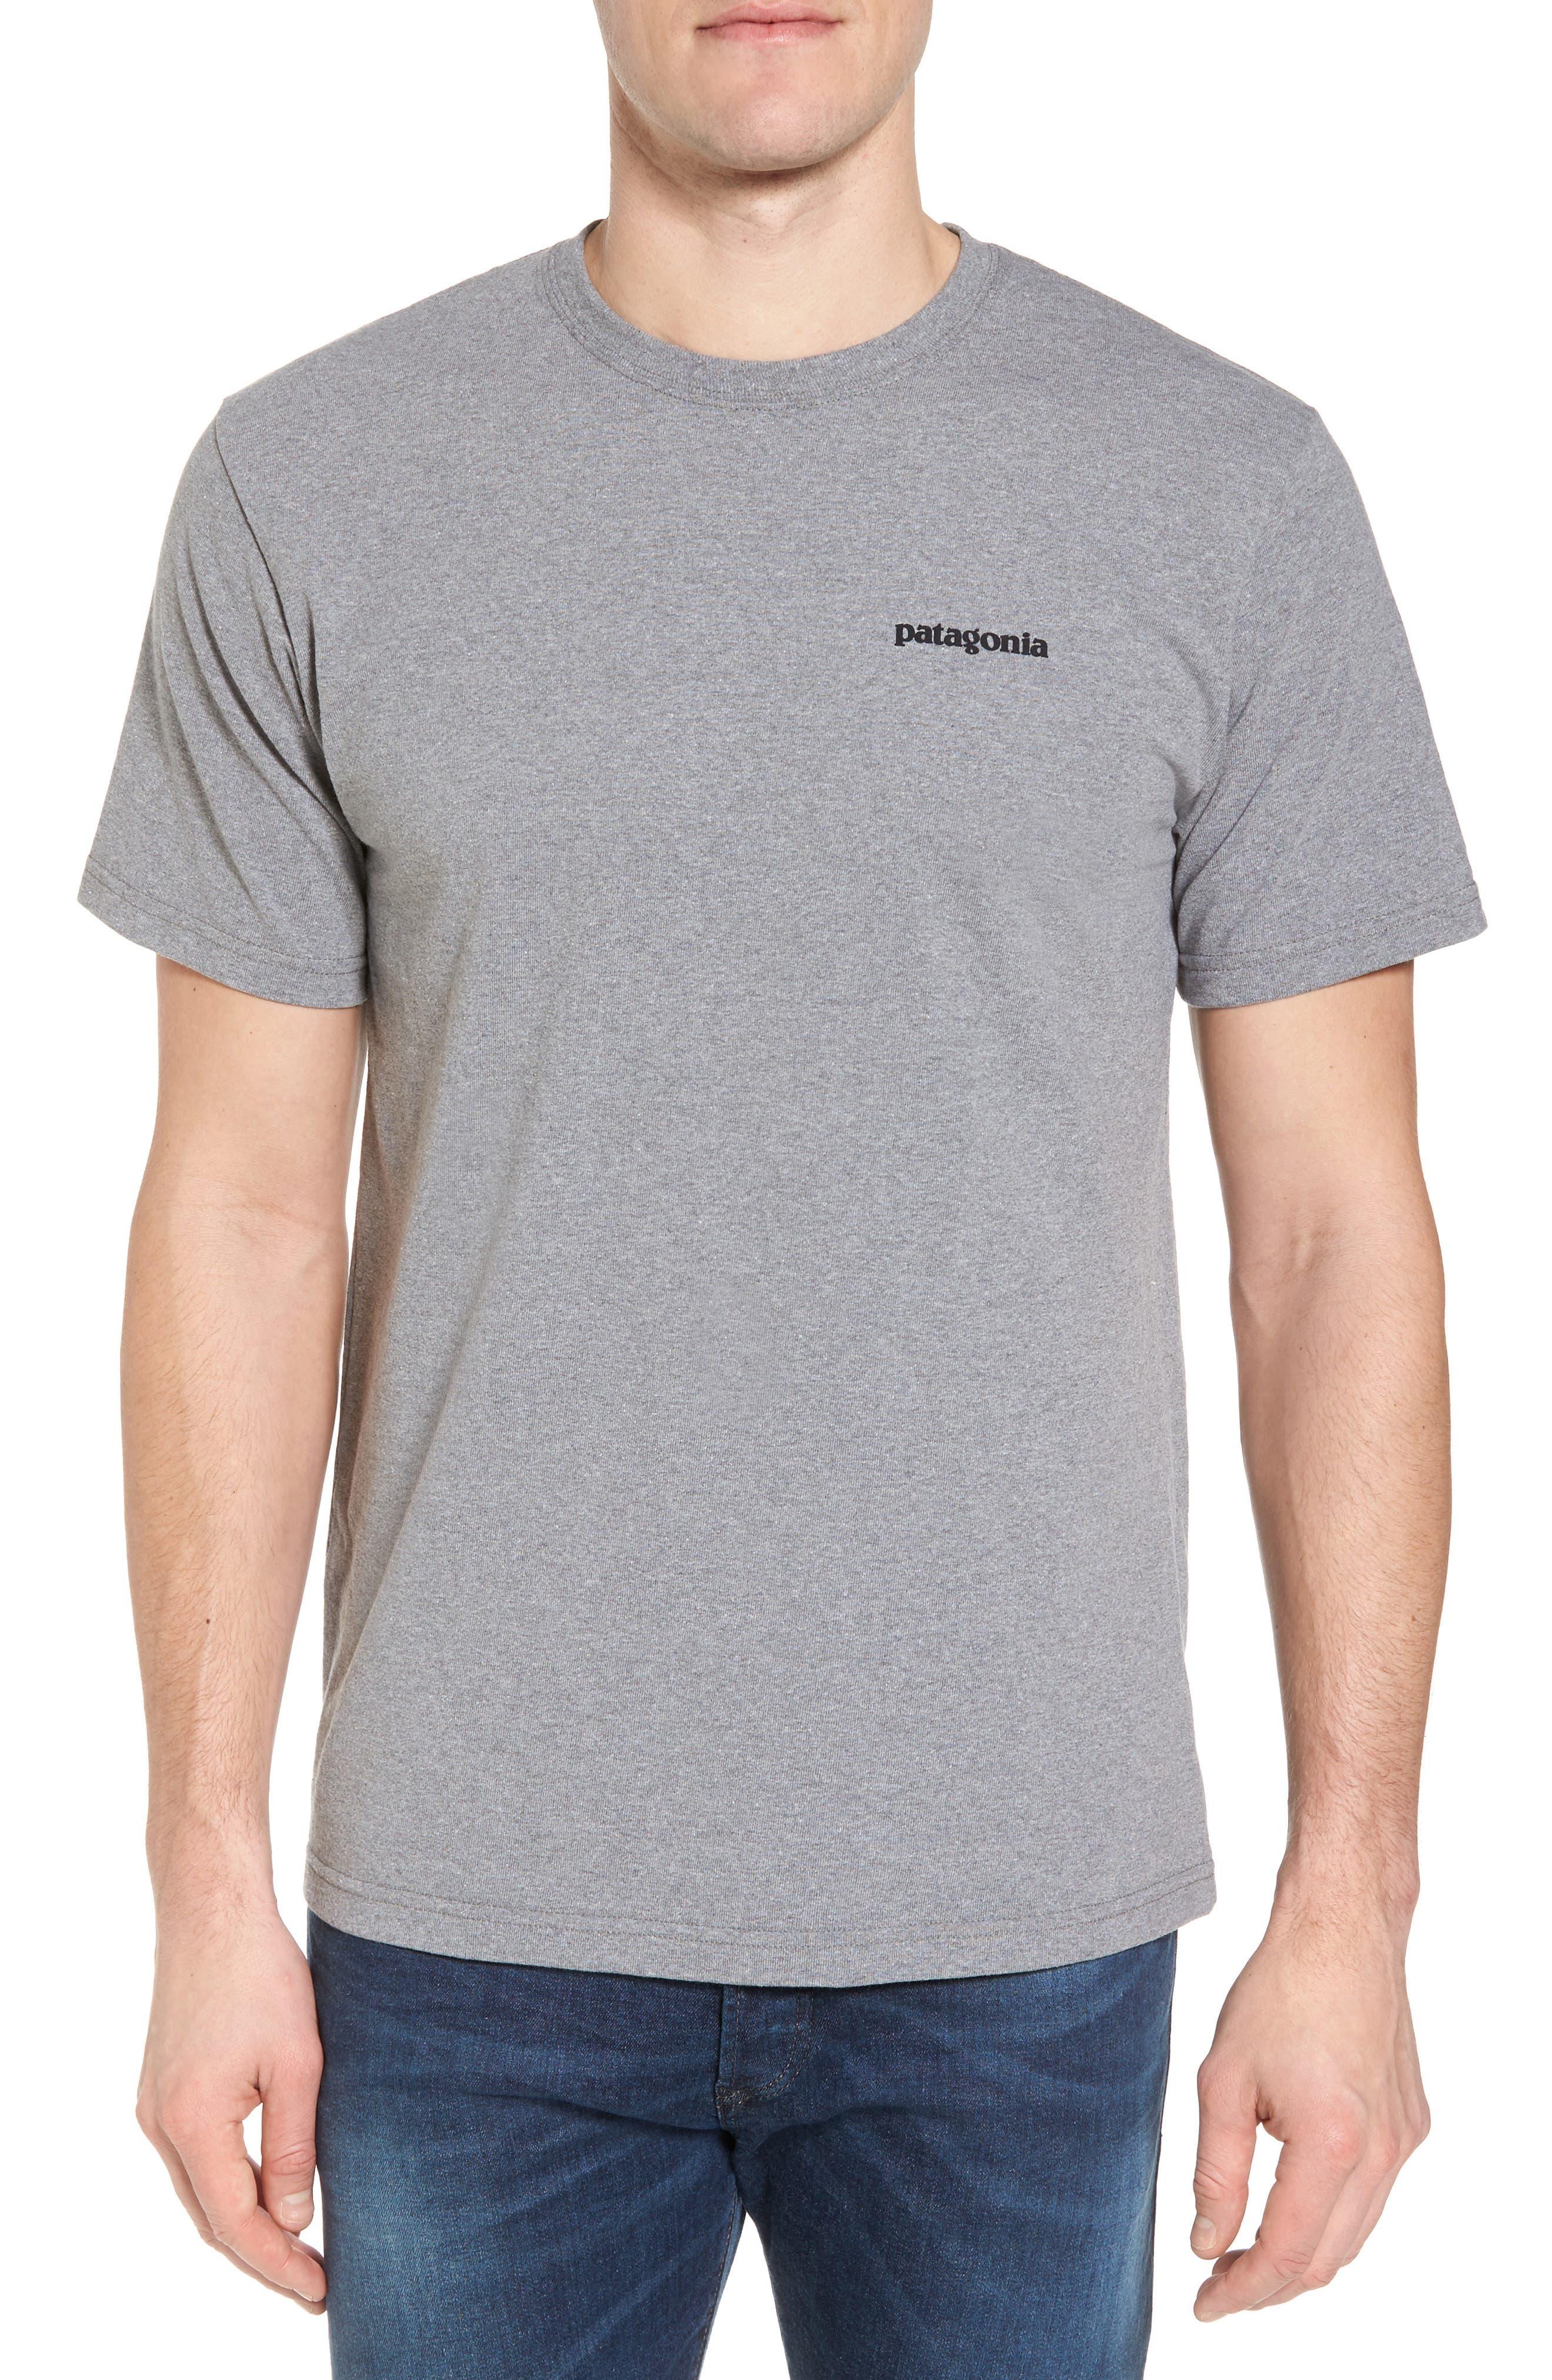 Patagonia Responsibili-Tee T-Shirt, Grey